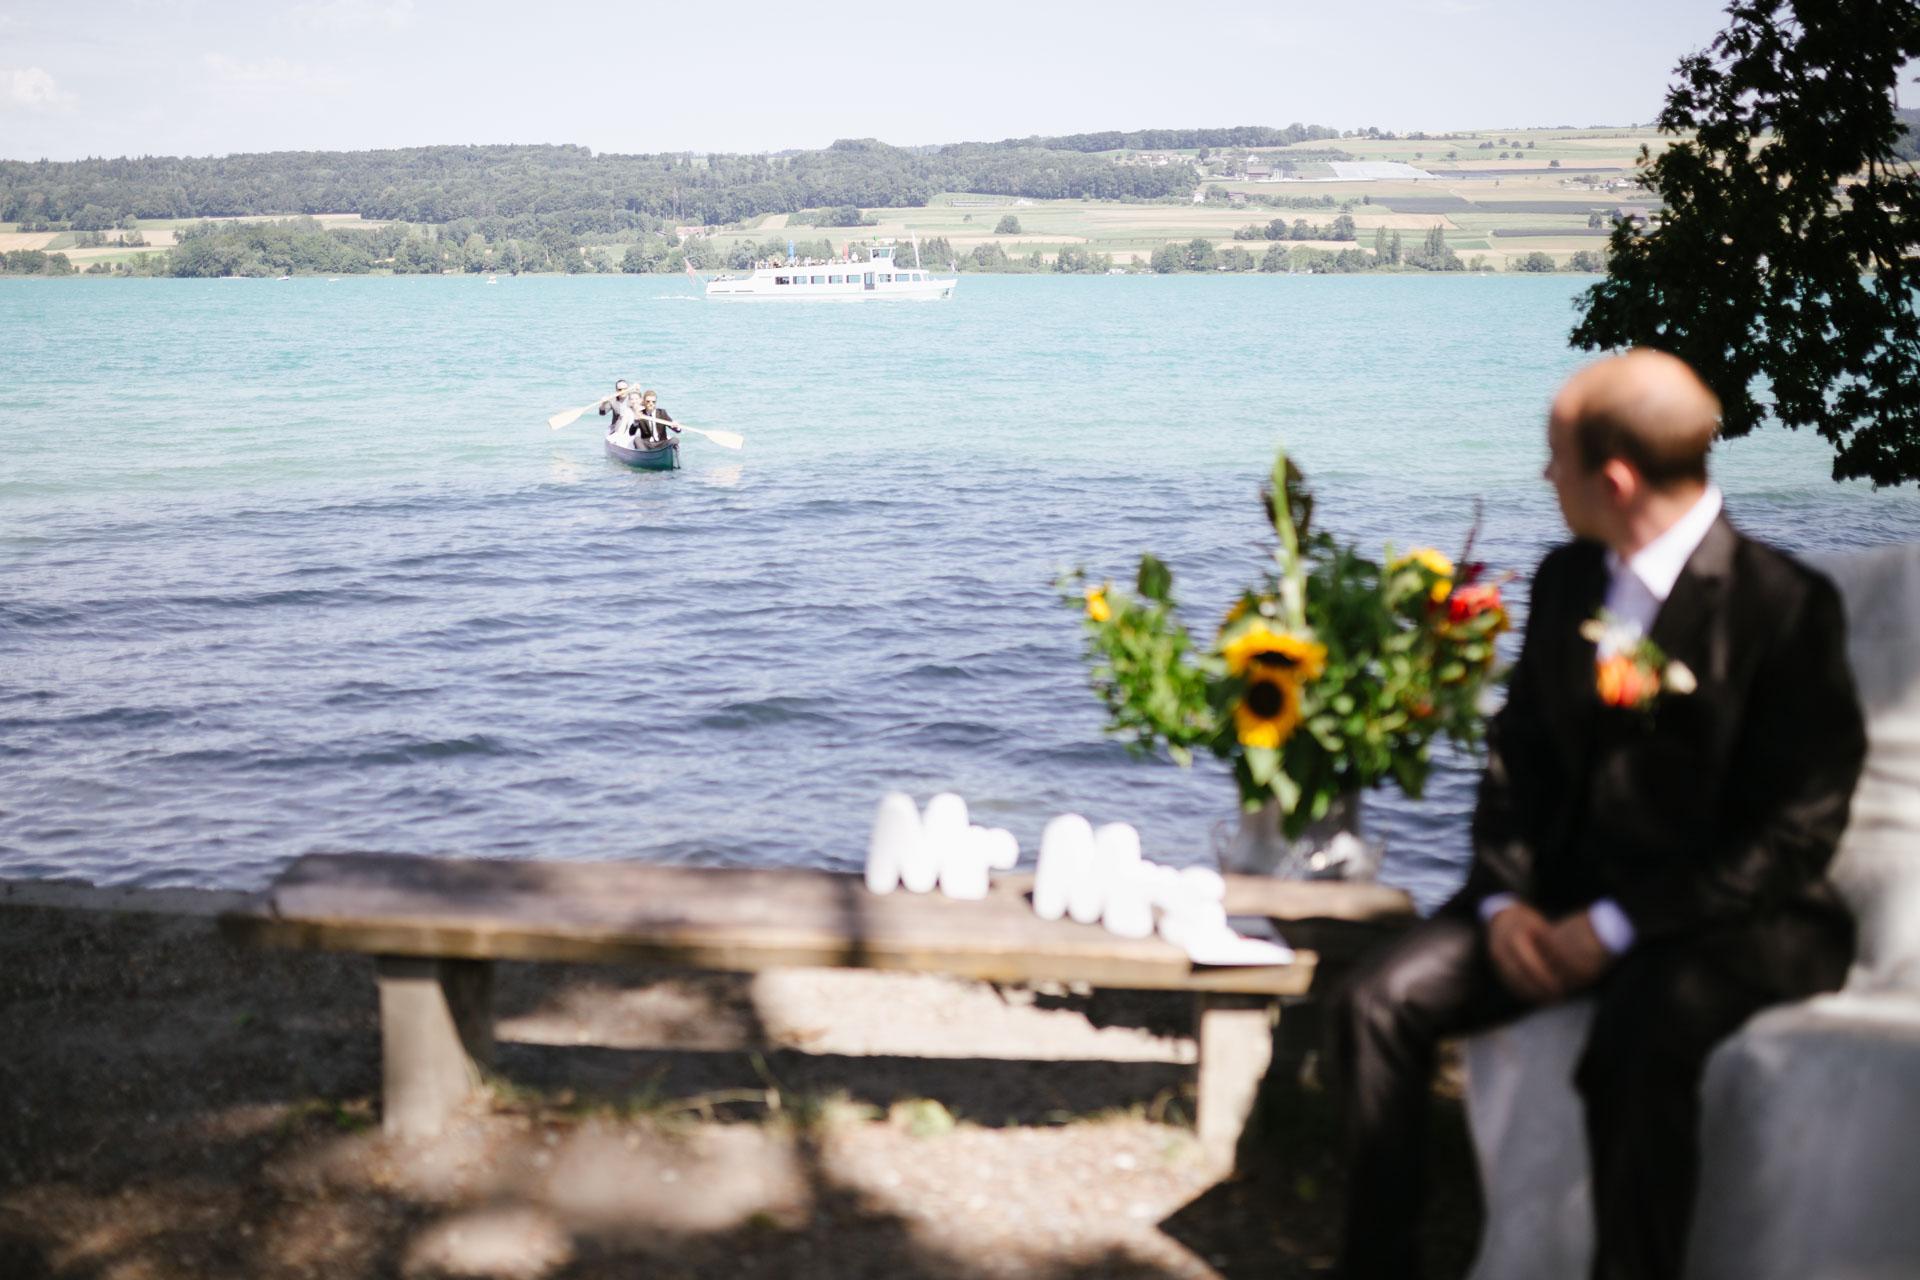 Pixelart_Hochzeitsfotografen_Loerrach_Rheinfelden_Hallwil_Schweiz_Linda-Ramon-1020